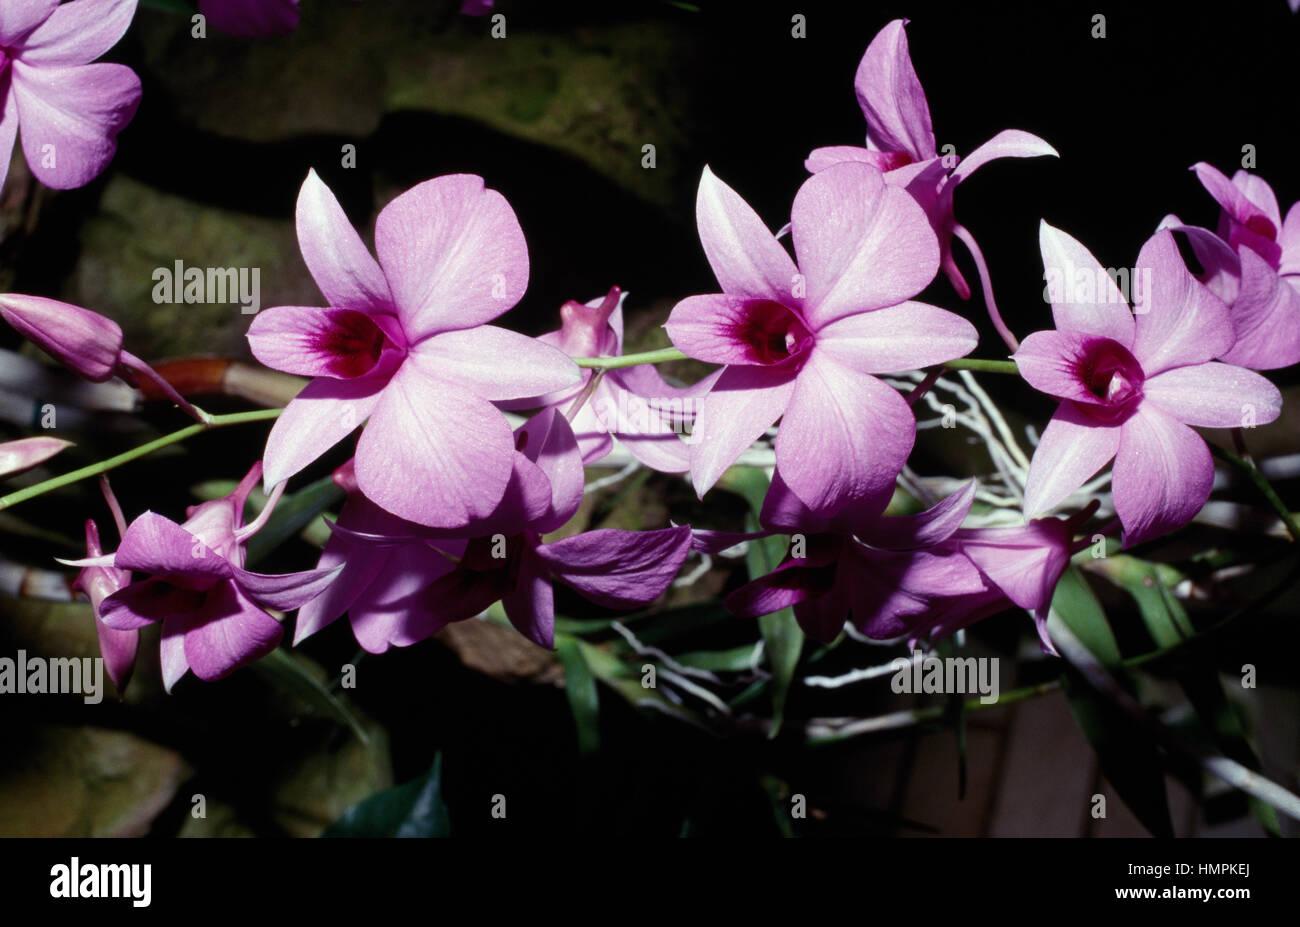 Barca orchidea Cymbidium (sp), Orchidaceae. Immagini Stock